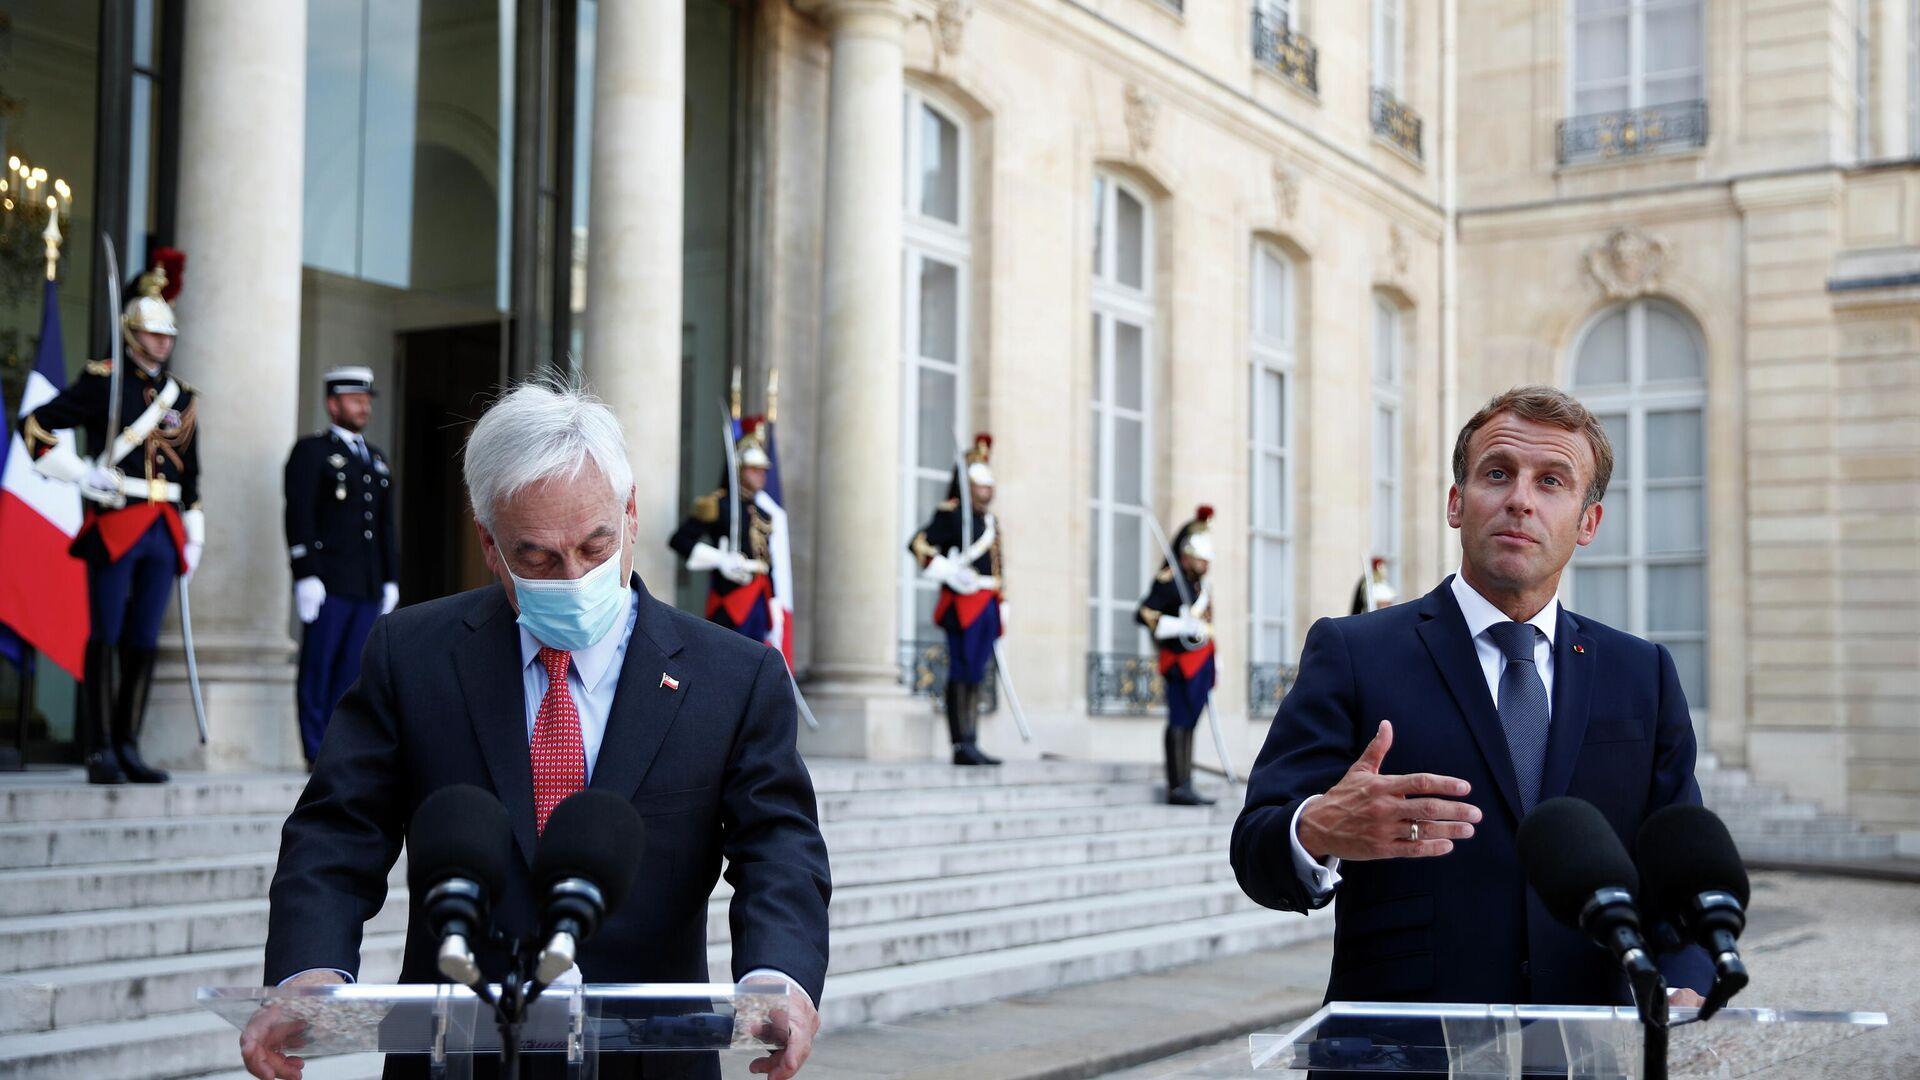 Sebastián Piñera, presidente de Chile, y Emmanuel Macron, presidente de Francia - Sputnik Mundo, 1920, 06.09.2021